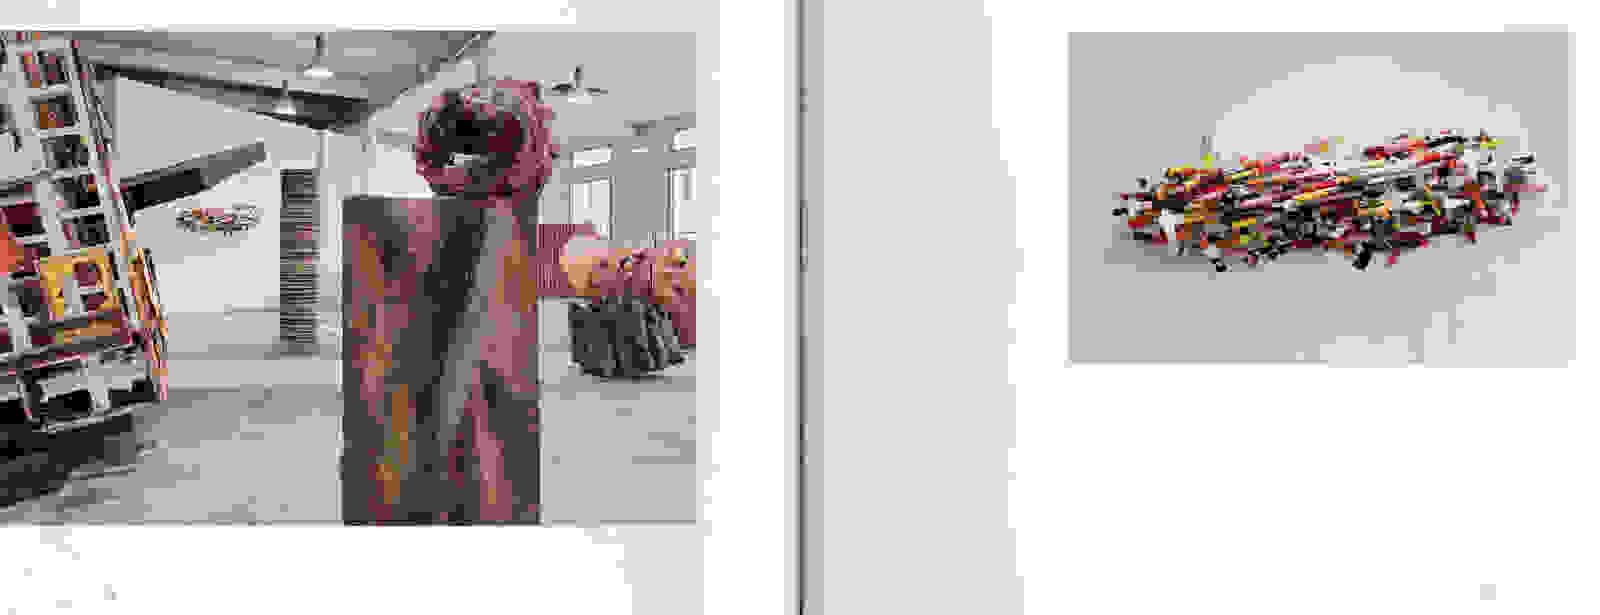 Phyllida Barlow DS 1600x615 8